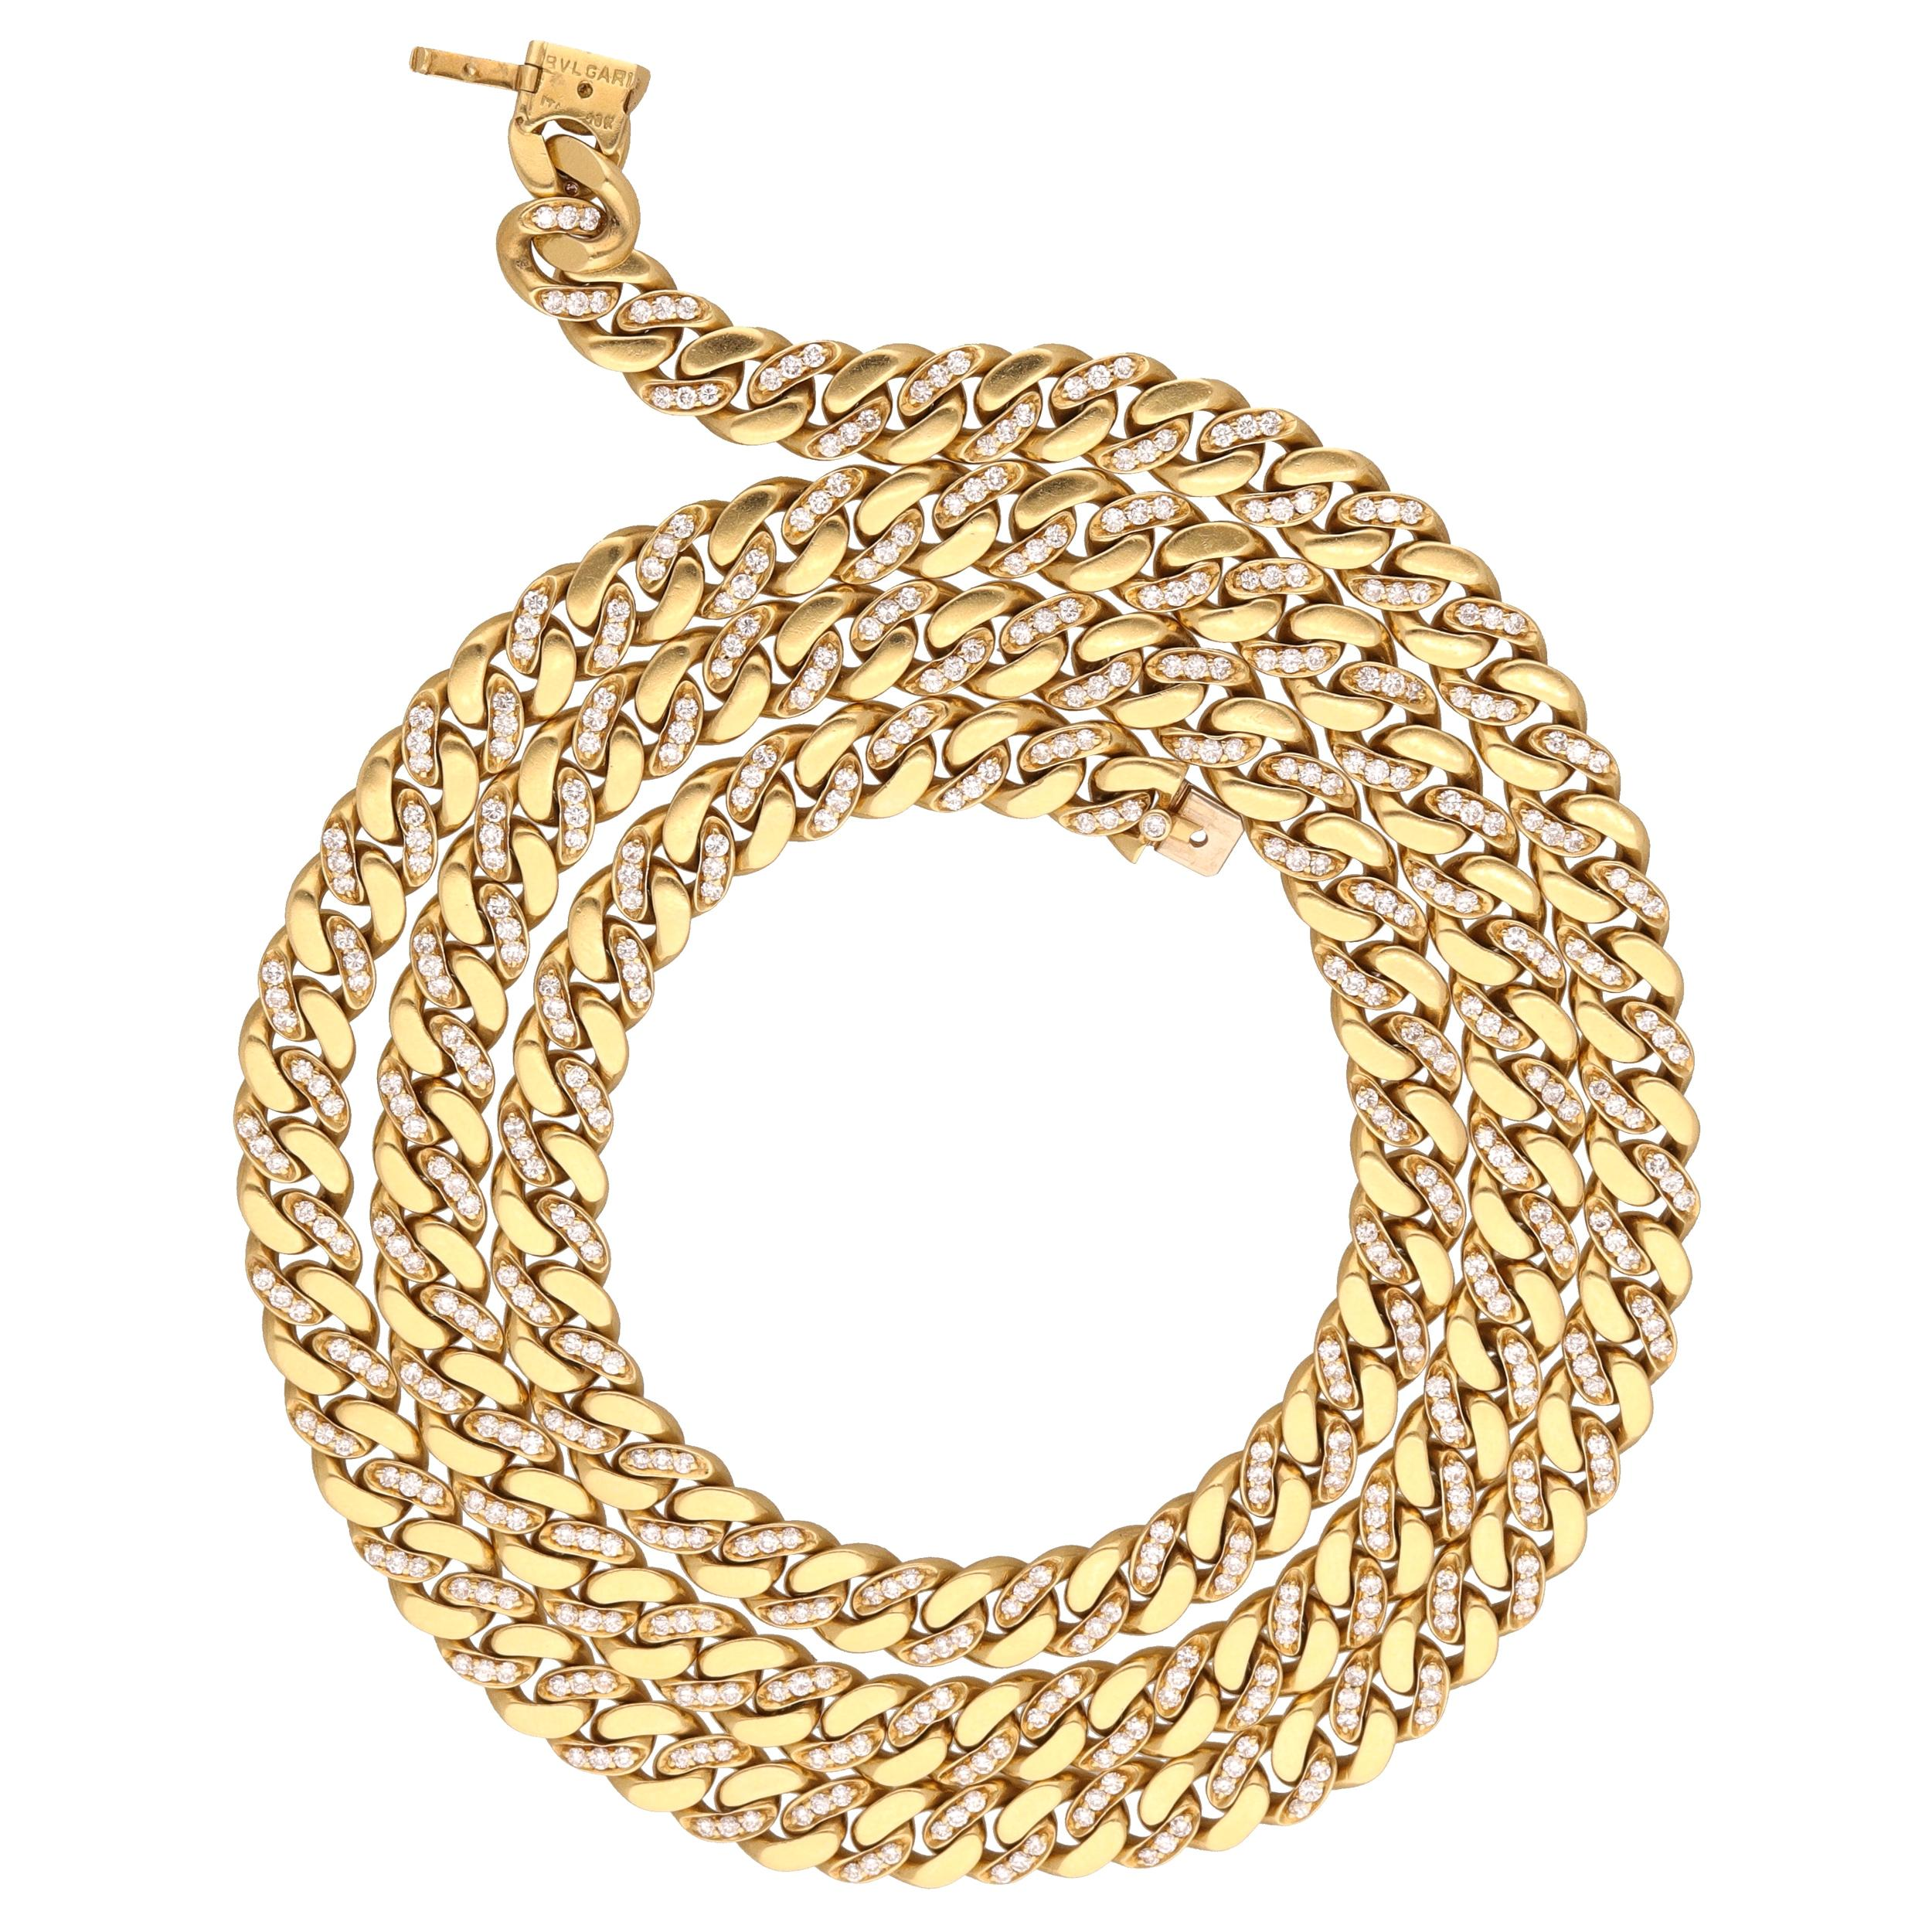 1980 Bulgari 18 Kt. Yellow Gold Diamonds Groumette Necklace